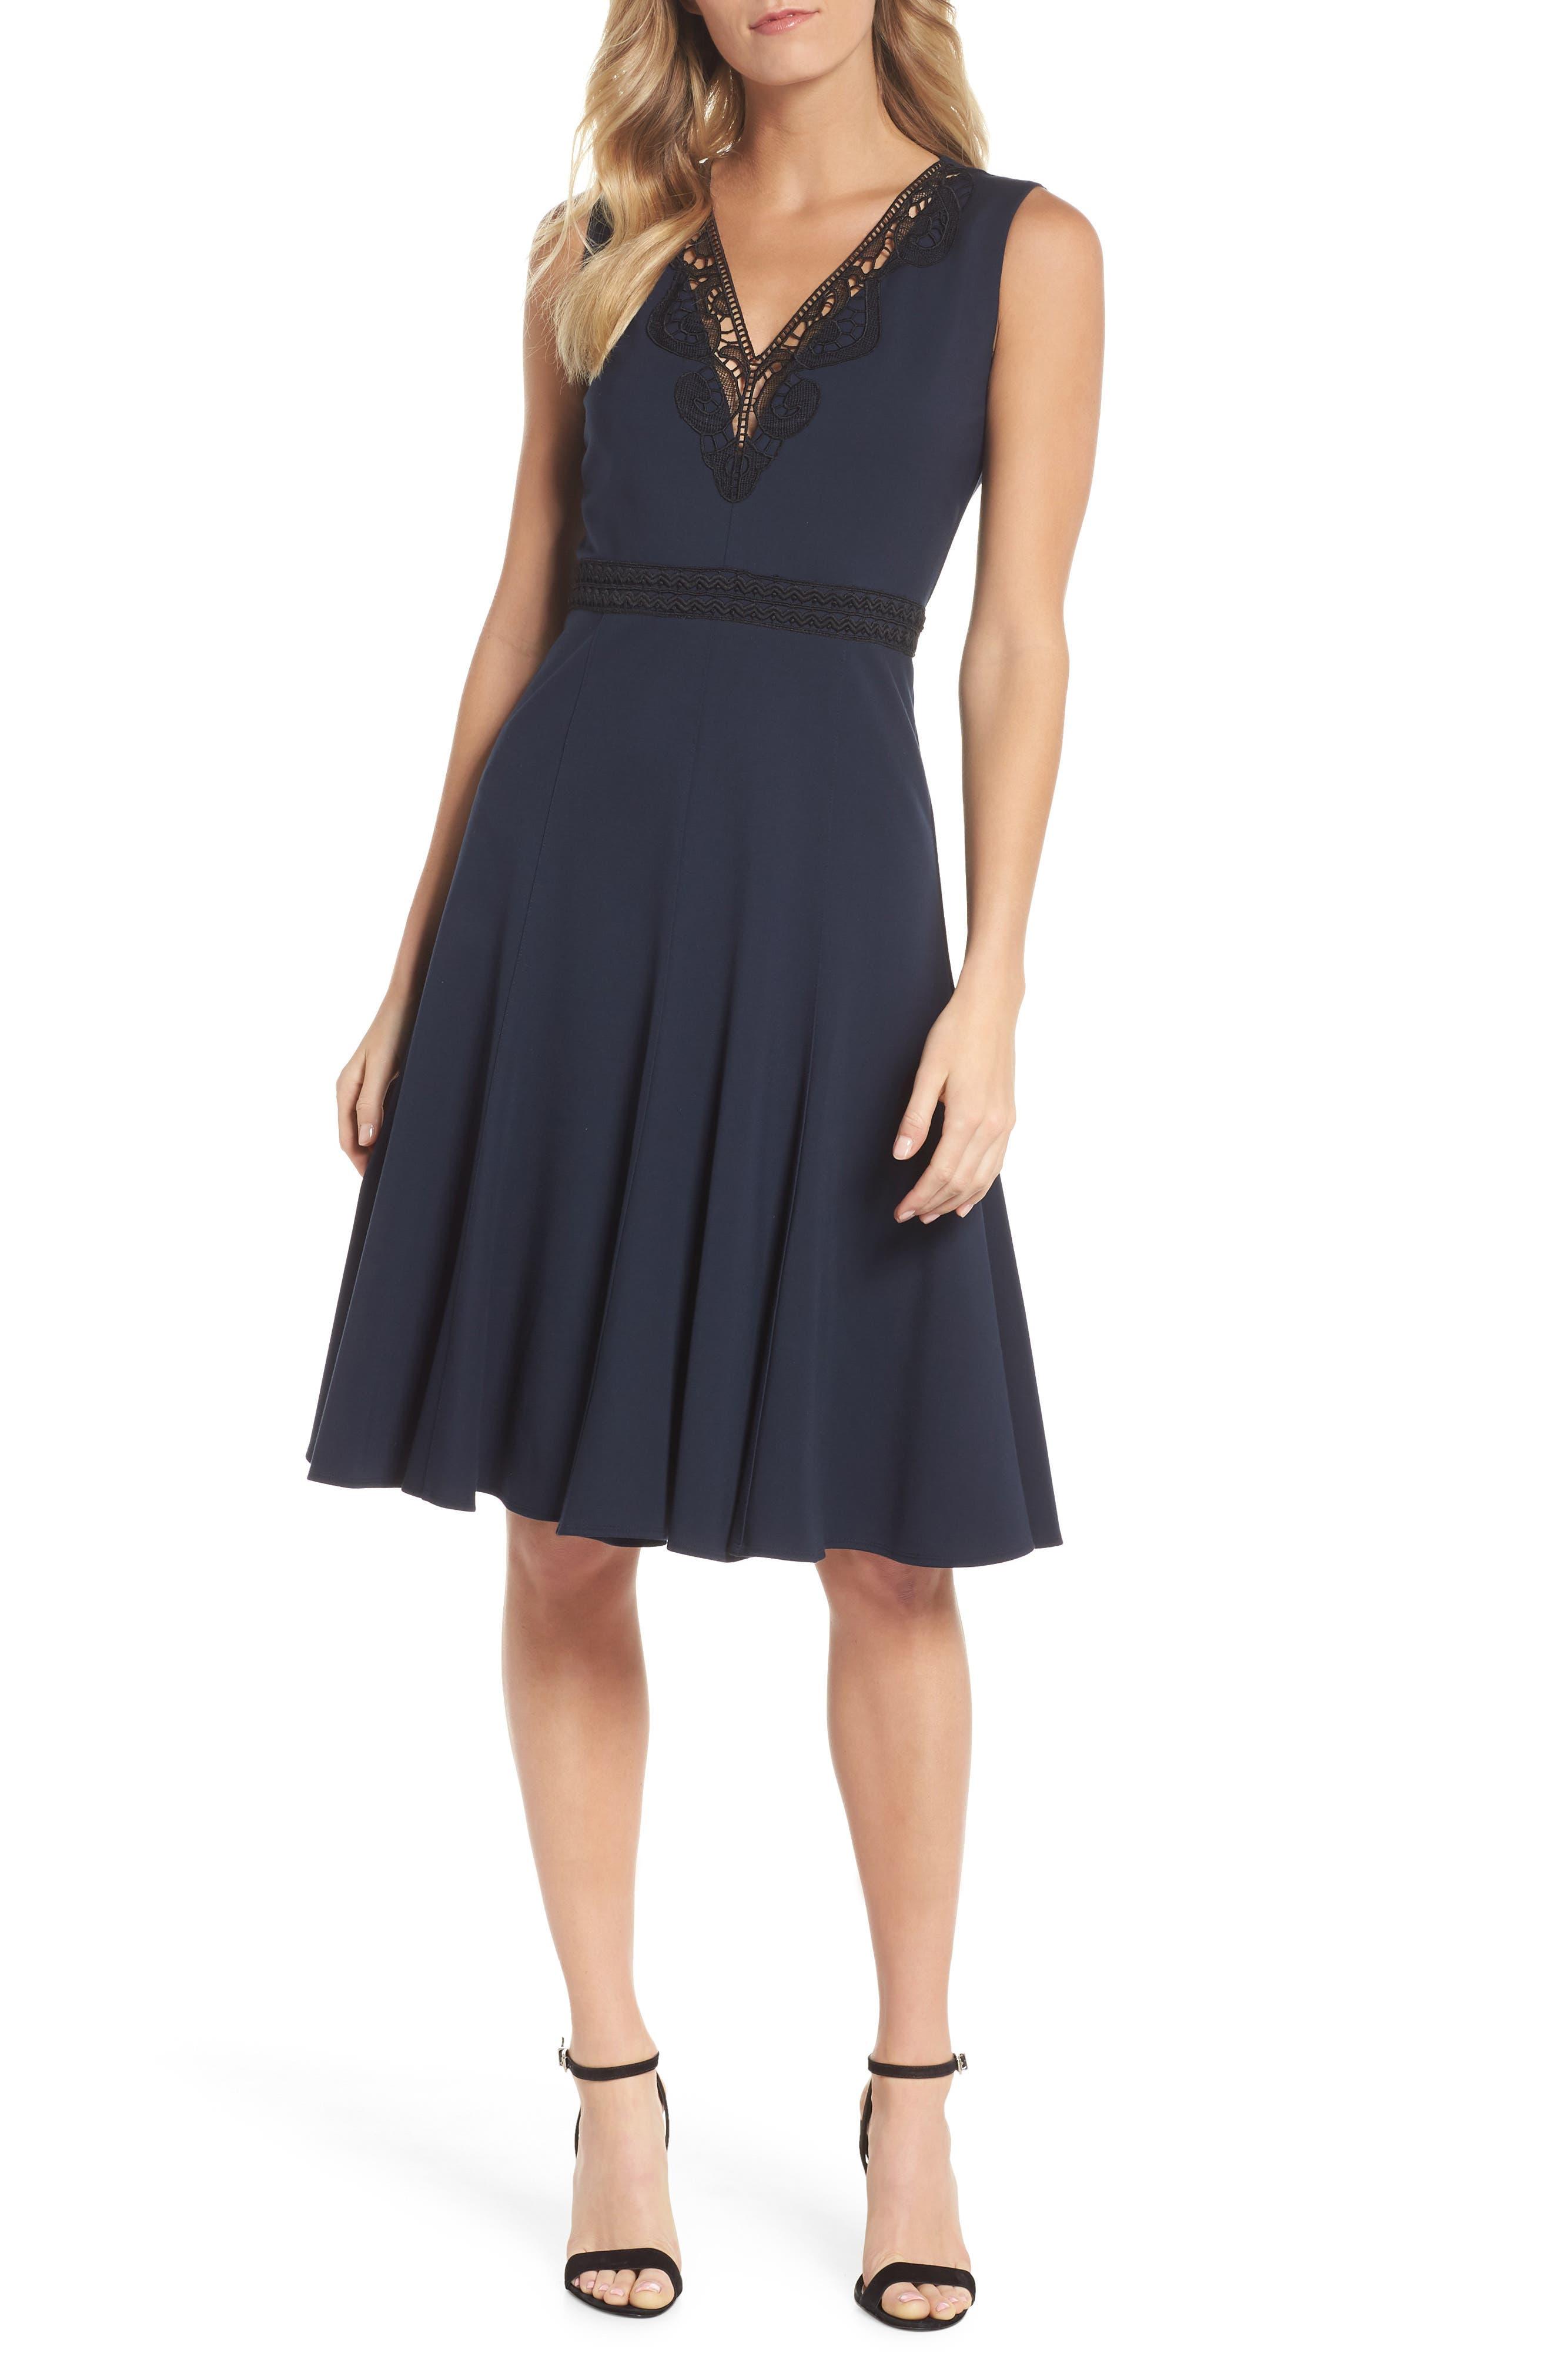 Hazel Lace Trim V-Neck Dress,                         Main,                         color, Midnight Blue/ Black